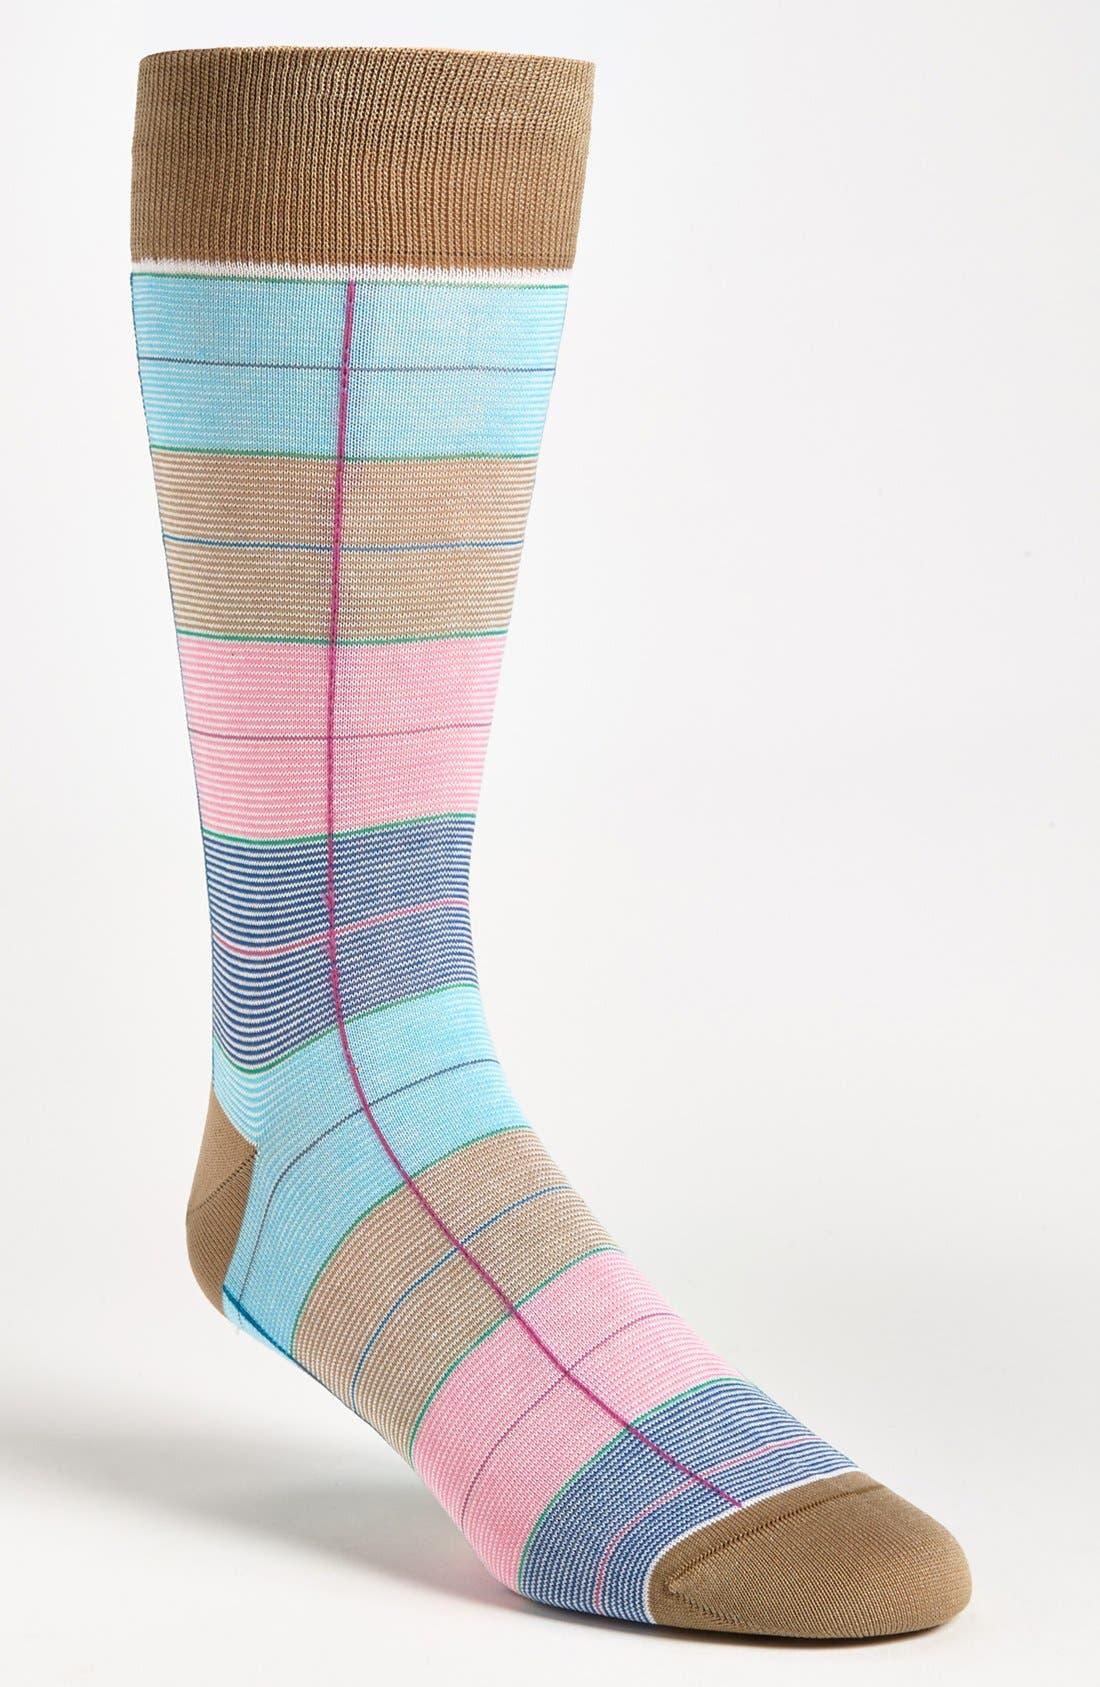 Main Image - Bugatchi Uomo Check Socks